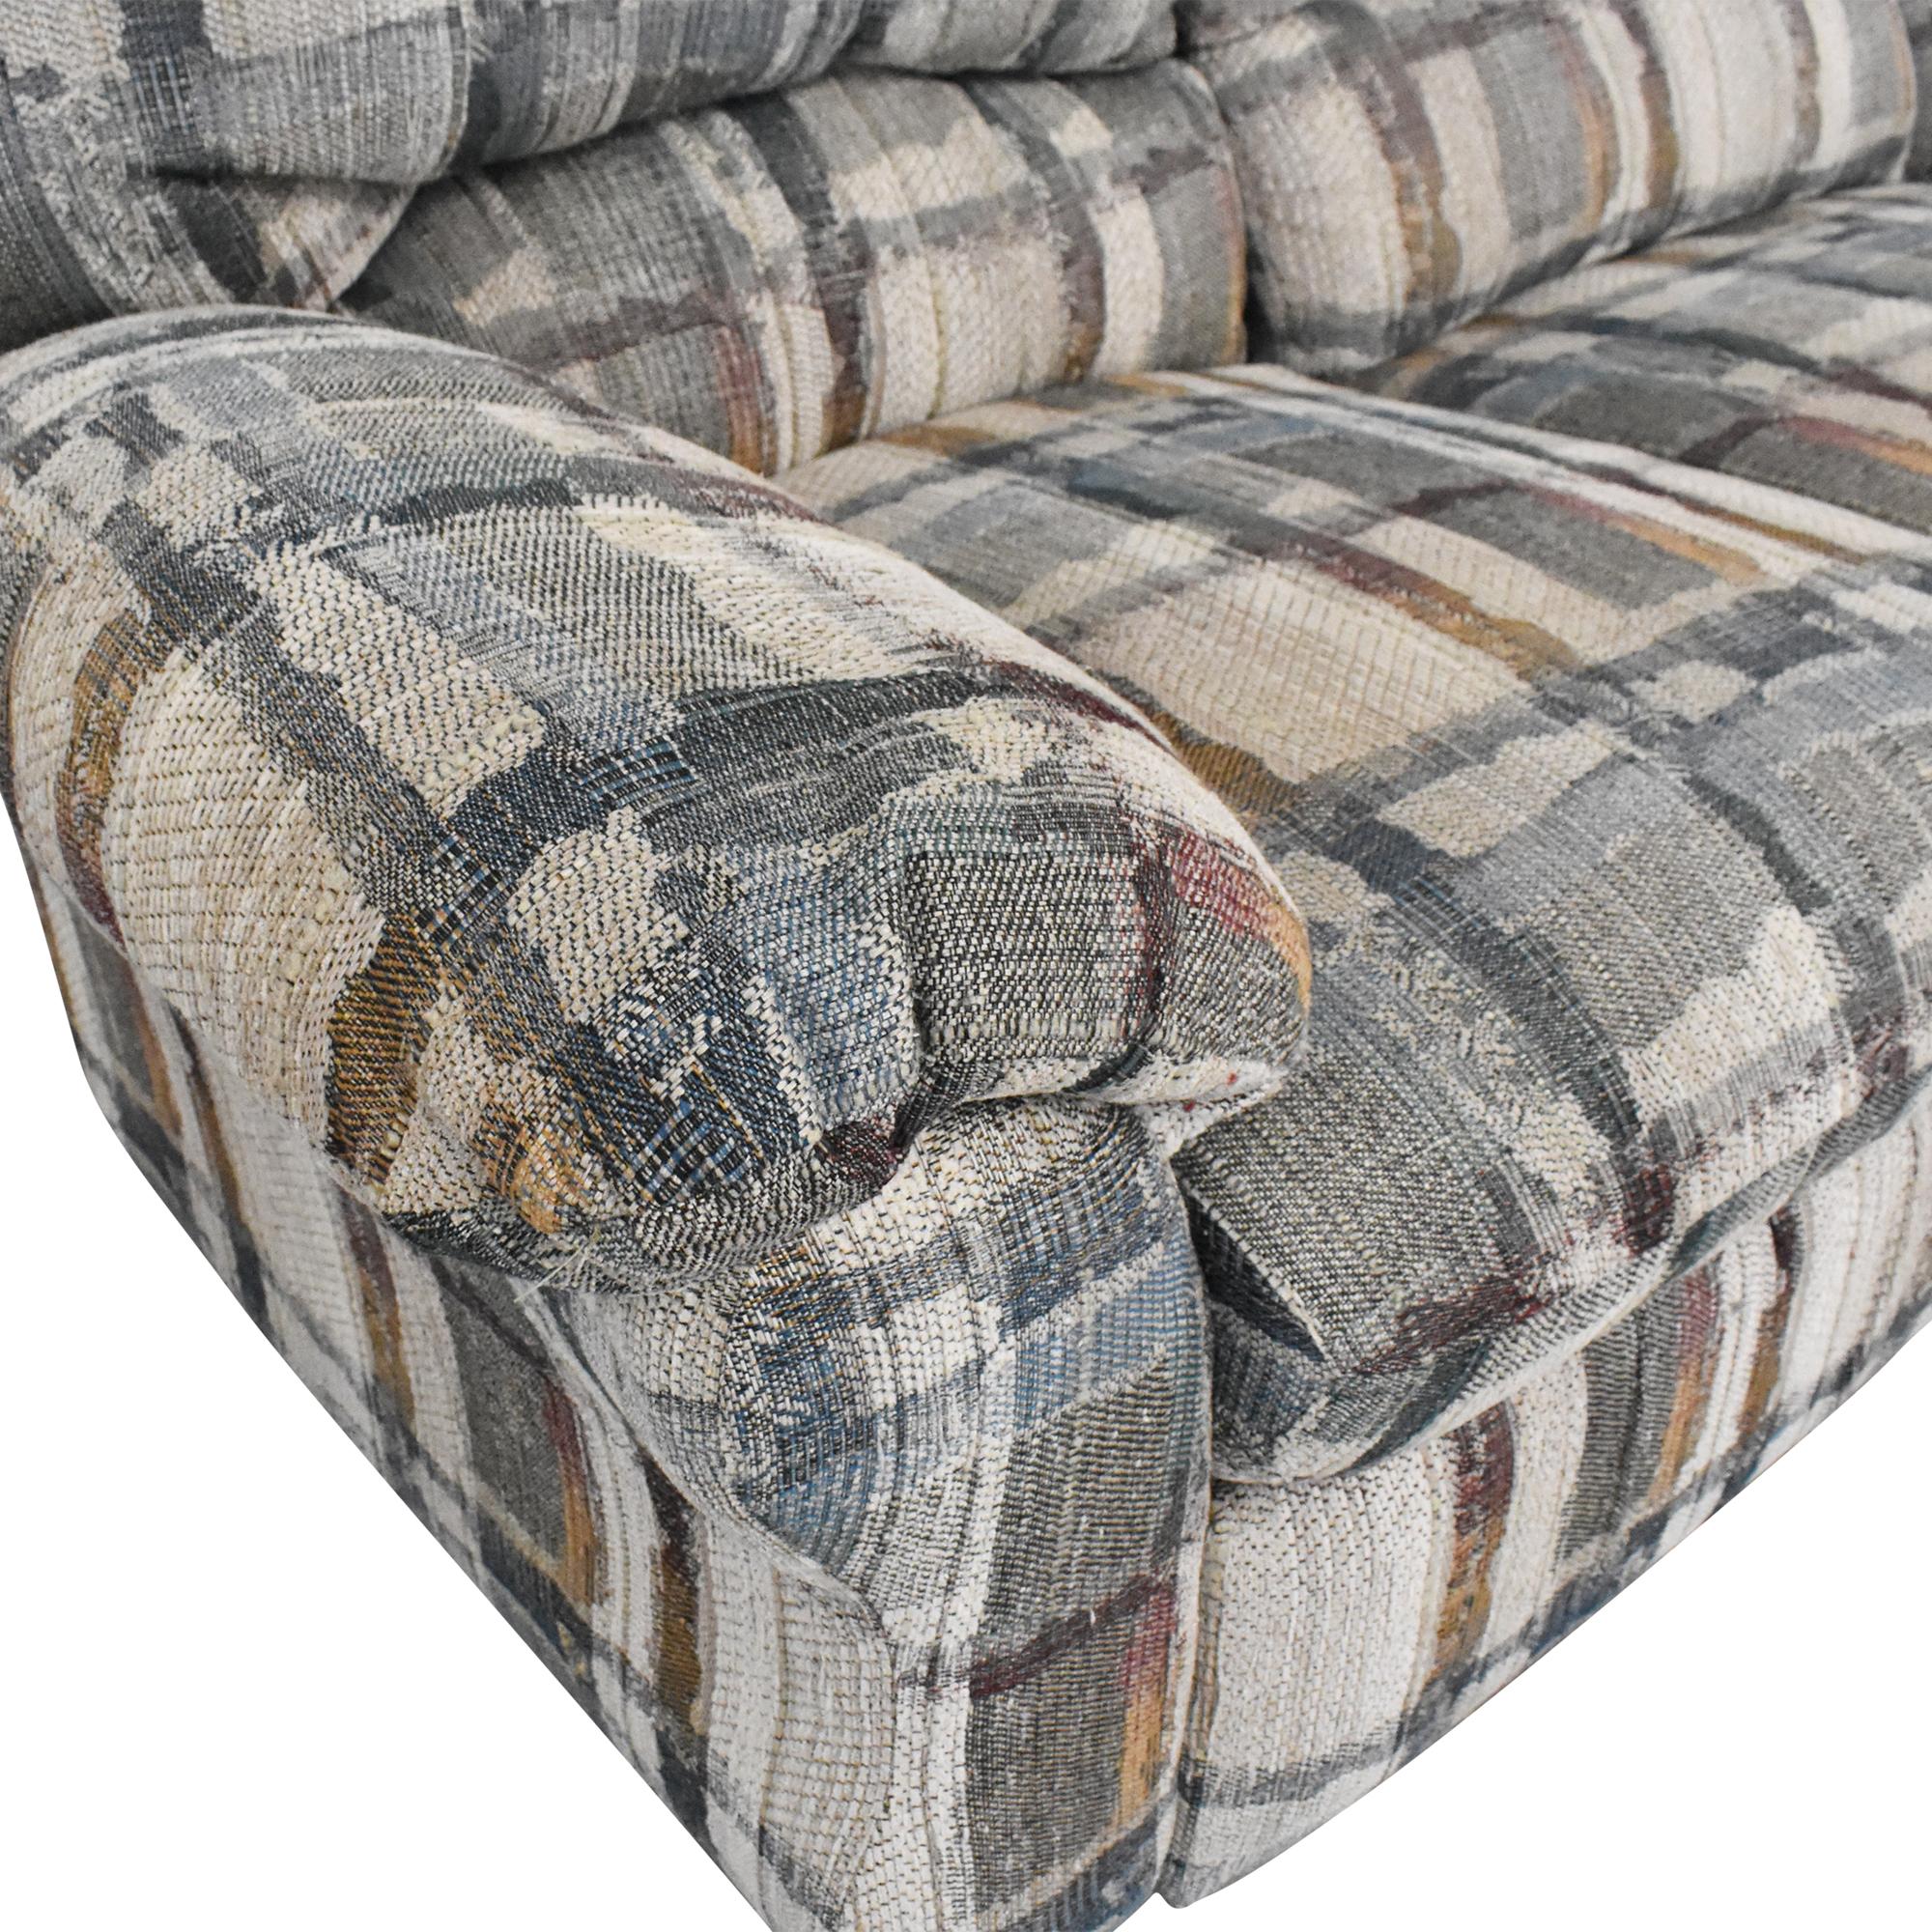 Berkline Berkline Crescent Sectional Sofa with Recliners ma